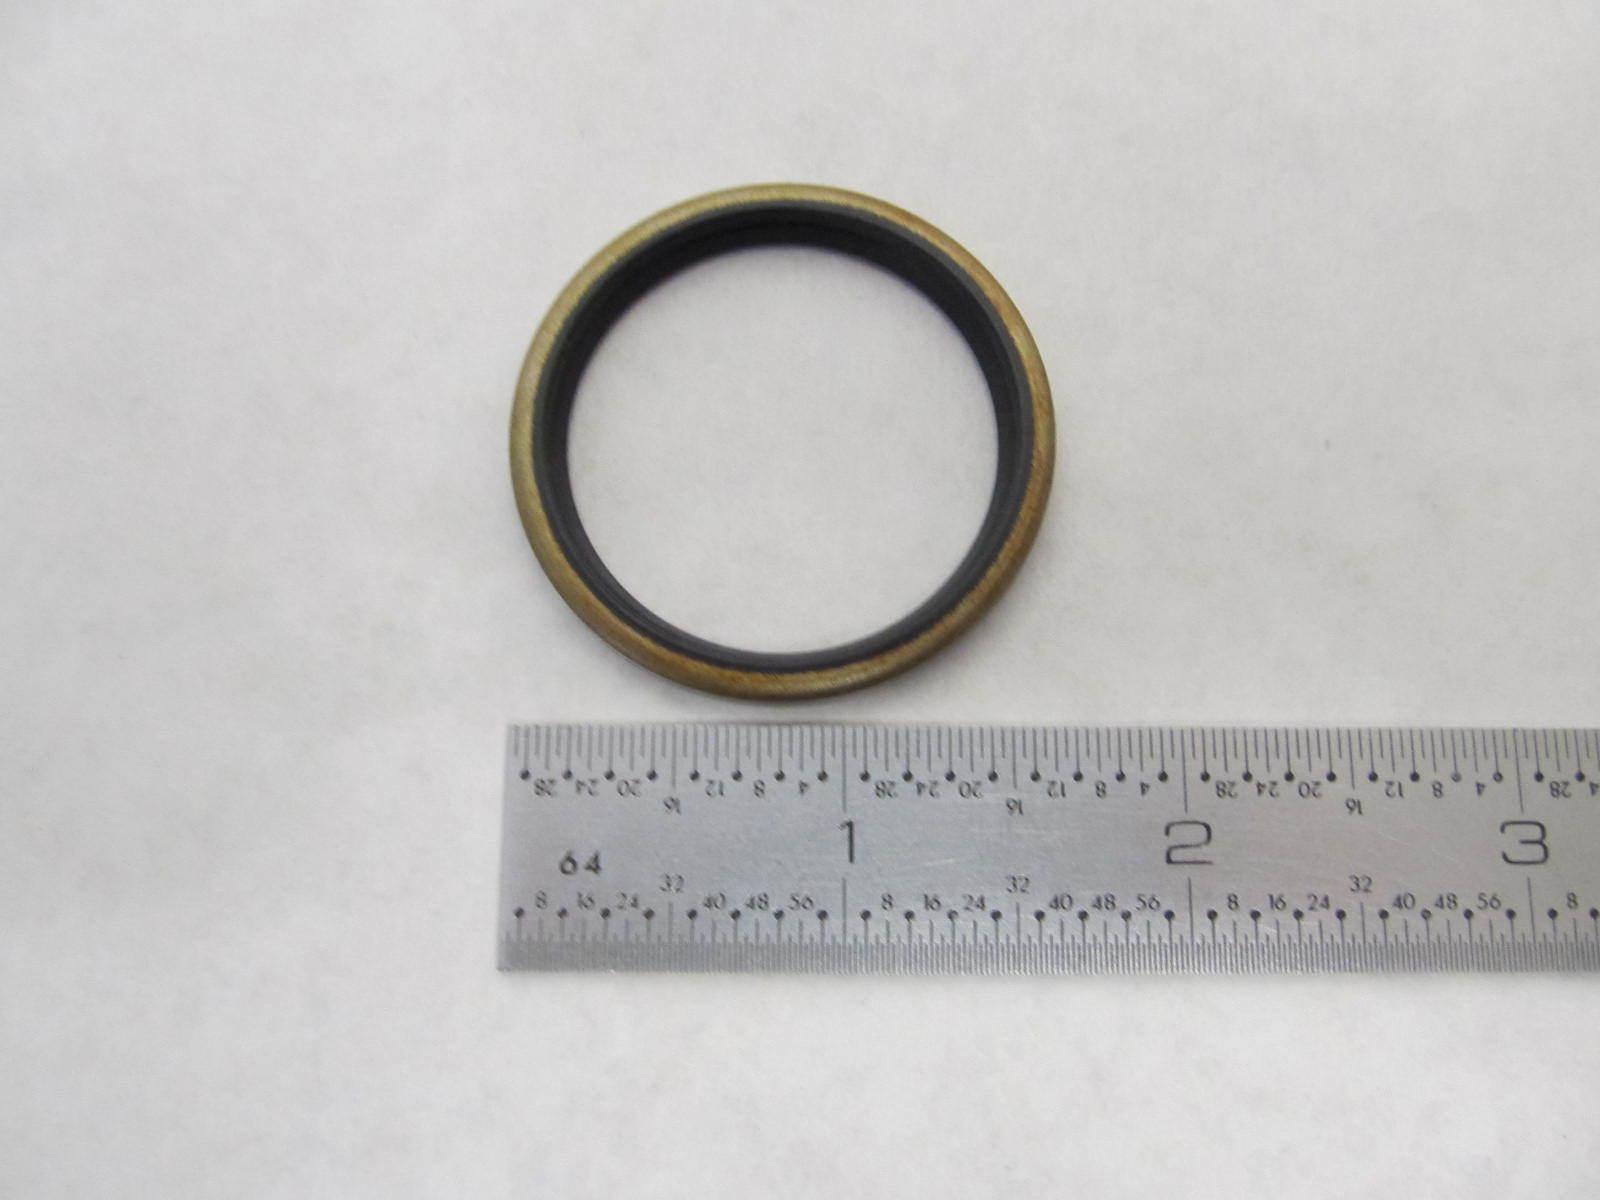 181620 Oil Sealing Ring for Volvo Penta Marine Engines